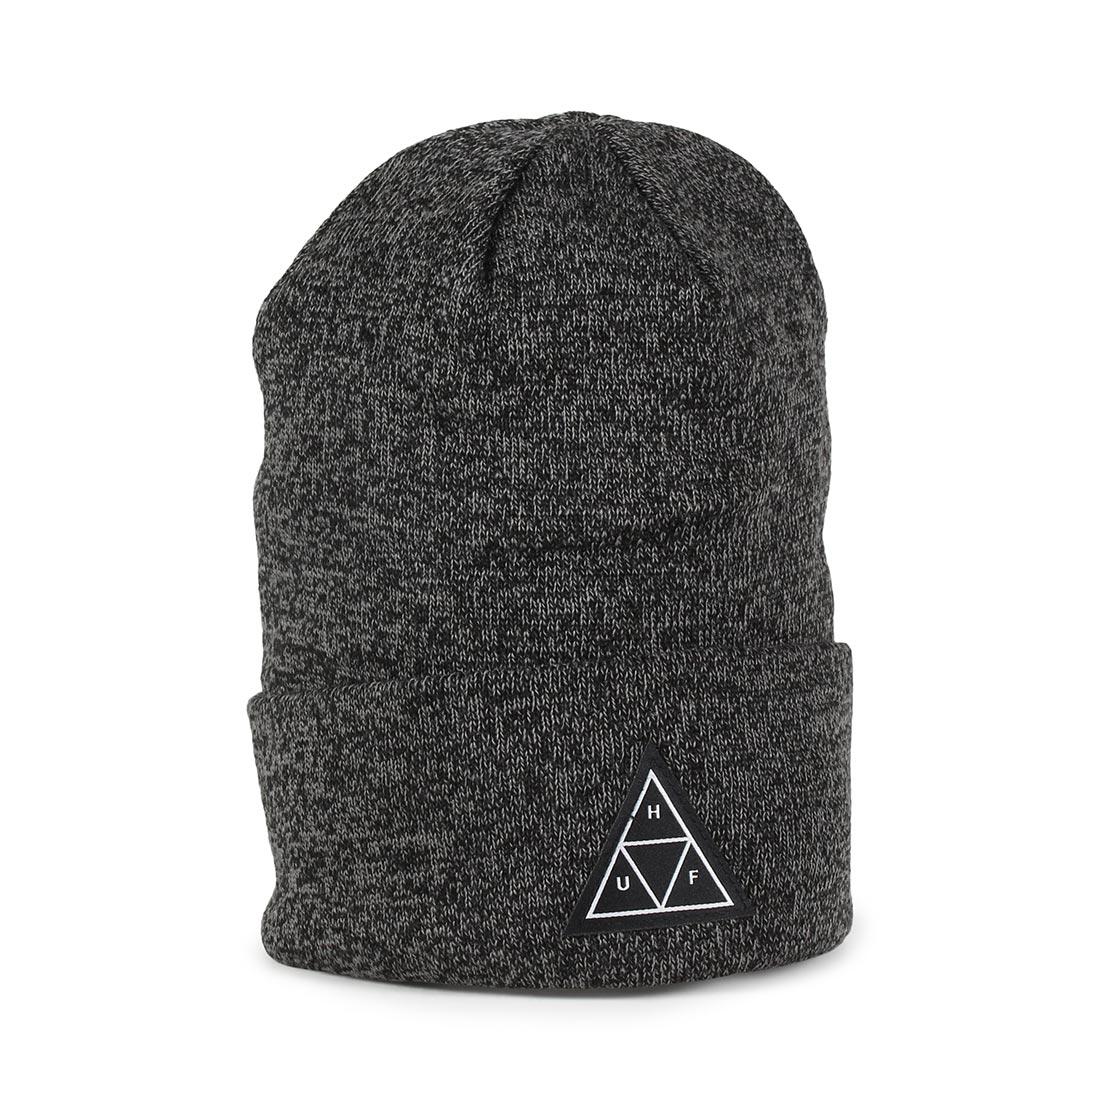 HUF Triple Triangle Beanie Hat - Black